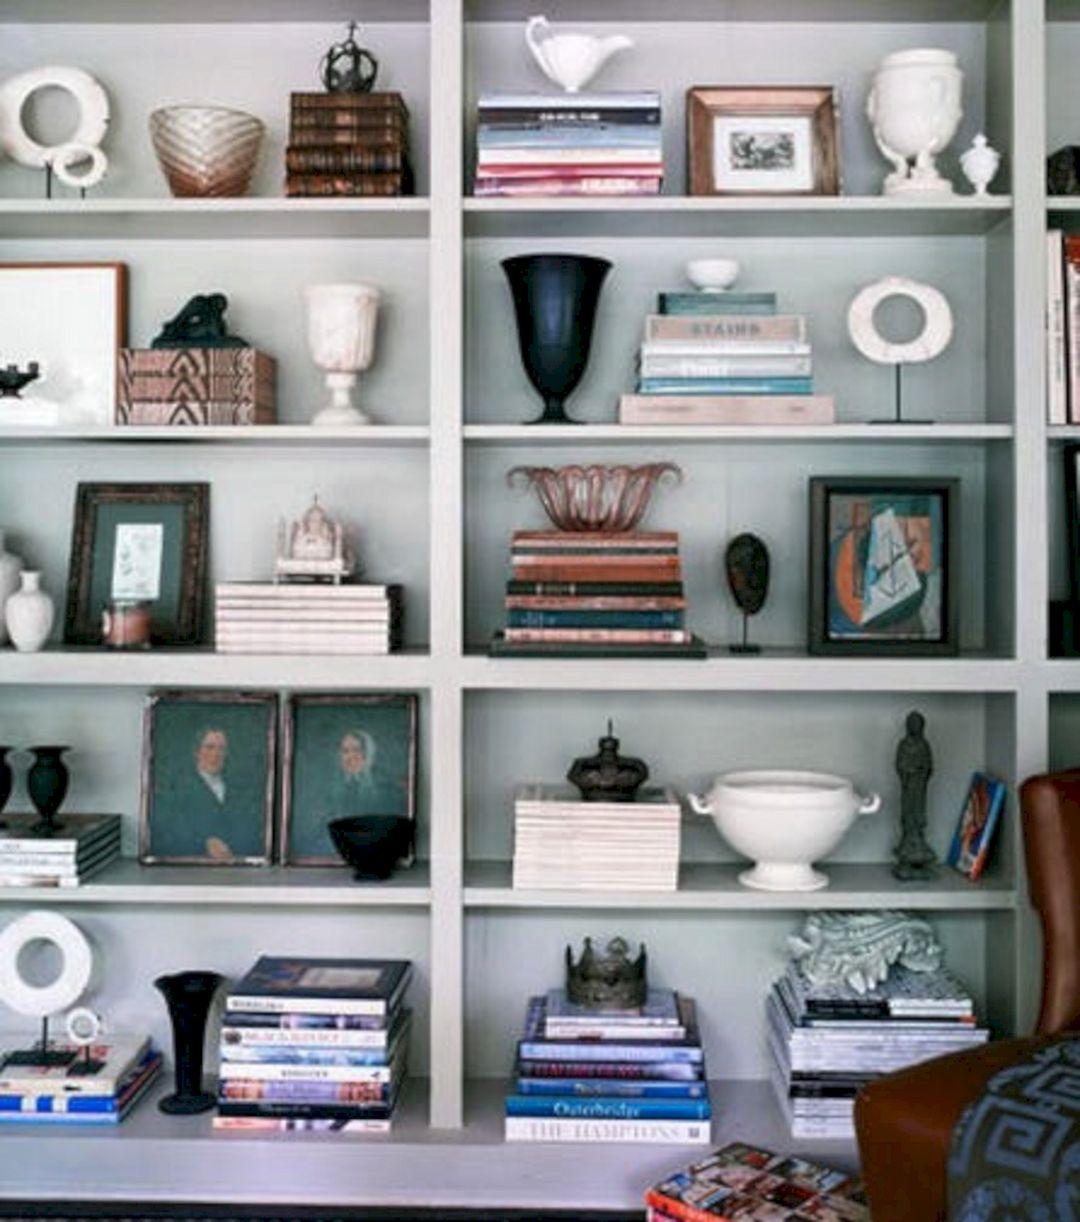 40+ Most Popular Bookshelf Decorating Ideas for Your Home – FresHOUZ